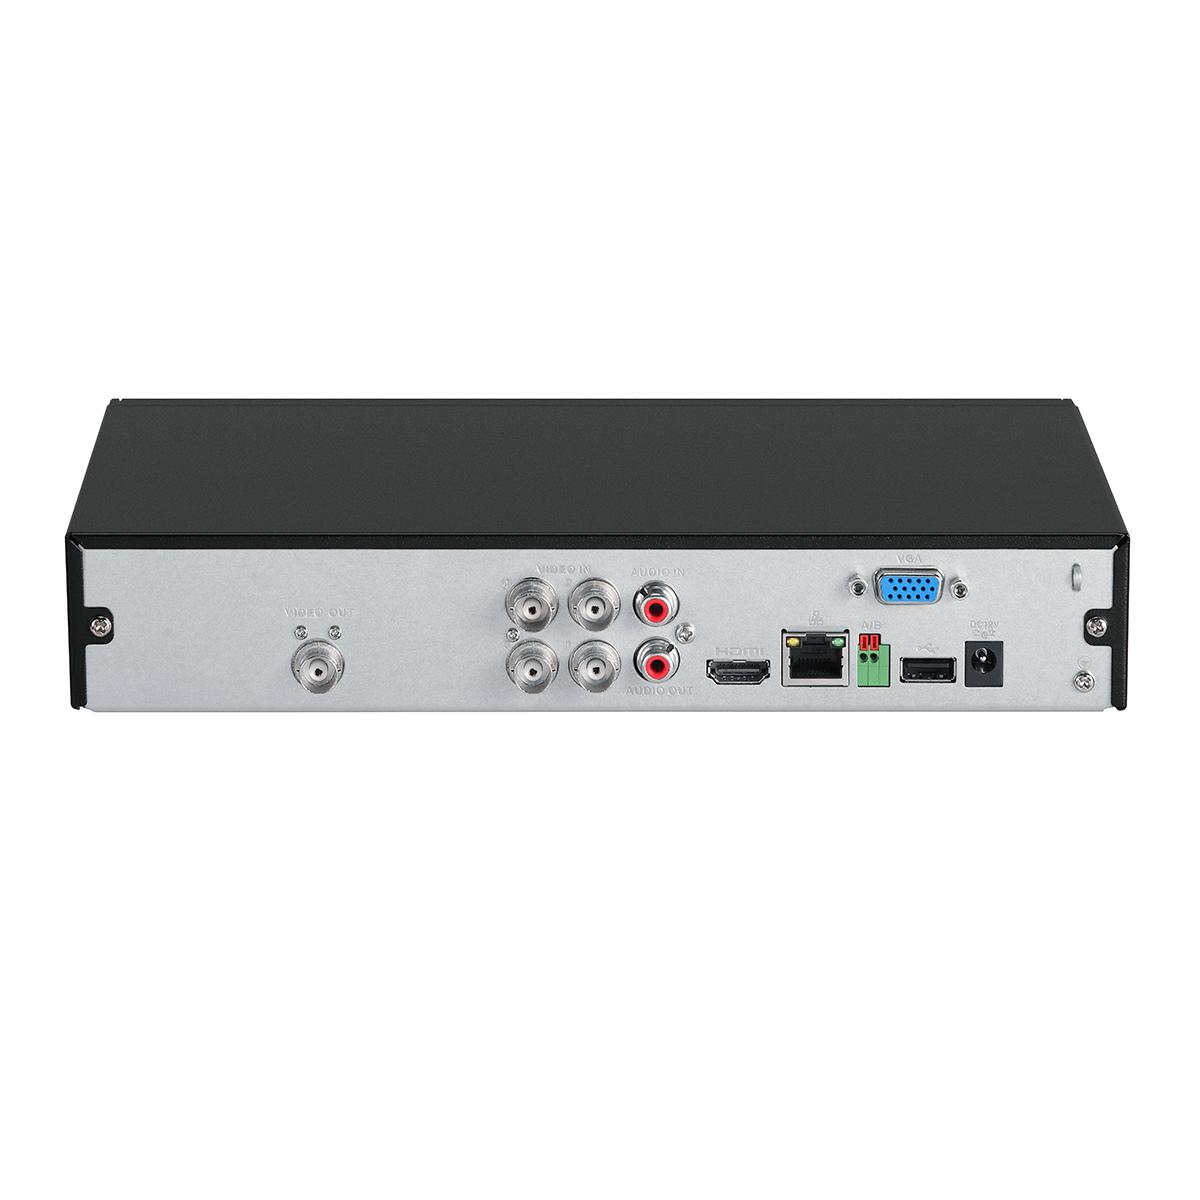 DVR Gravador de Vídeo 4 Canais HD 720p - 1080p Lite MHDX 1104 com HD 1TB Embarcado Intelbras